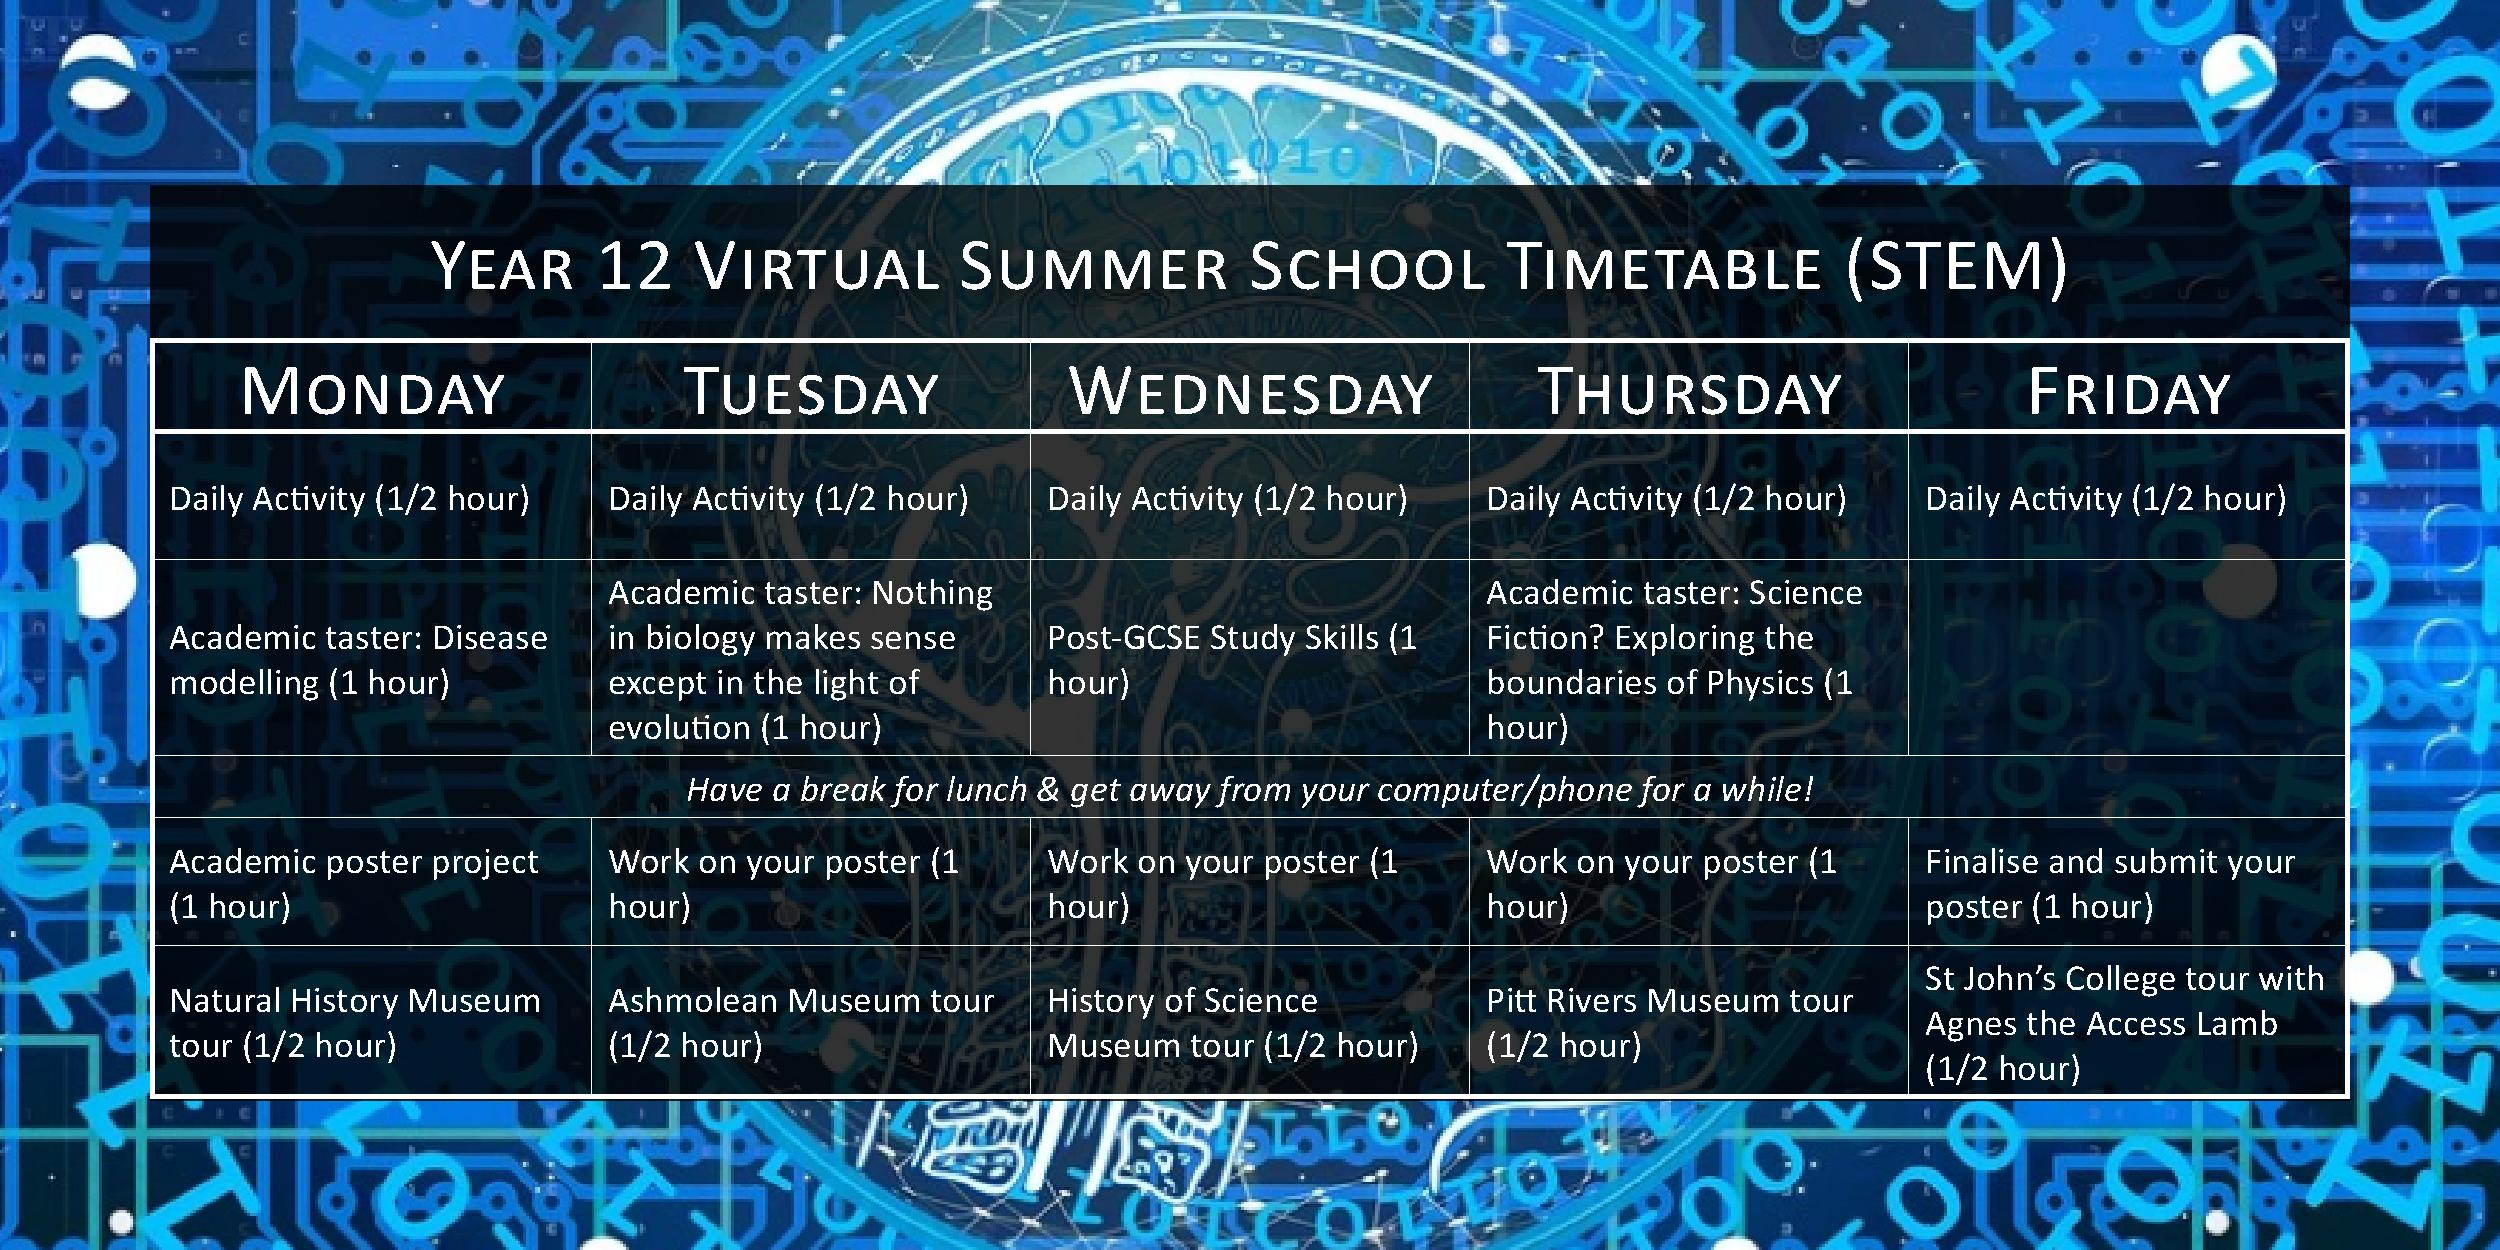 Year 12 Virtual Summer School timetable (STEM)